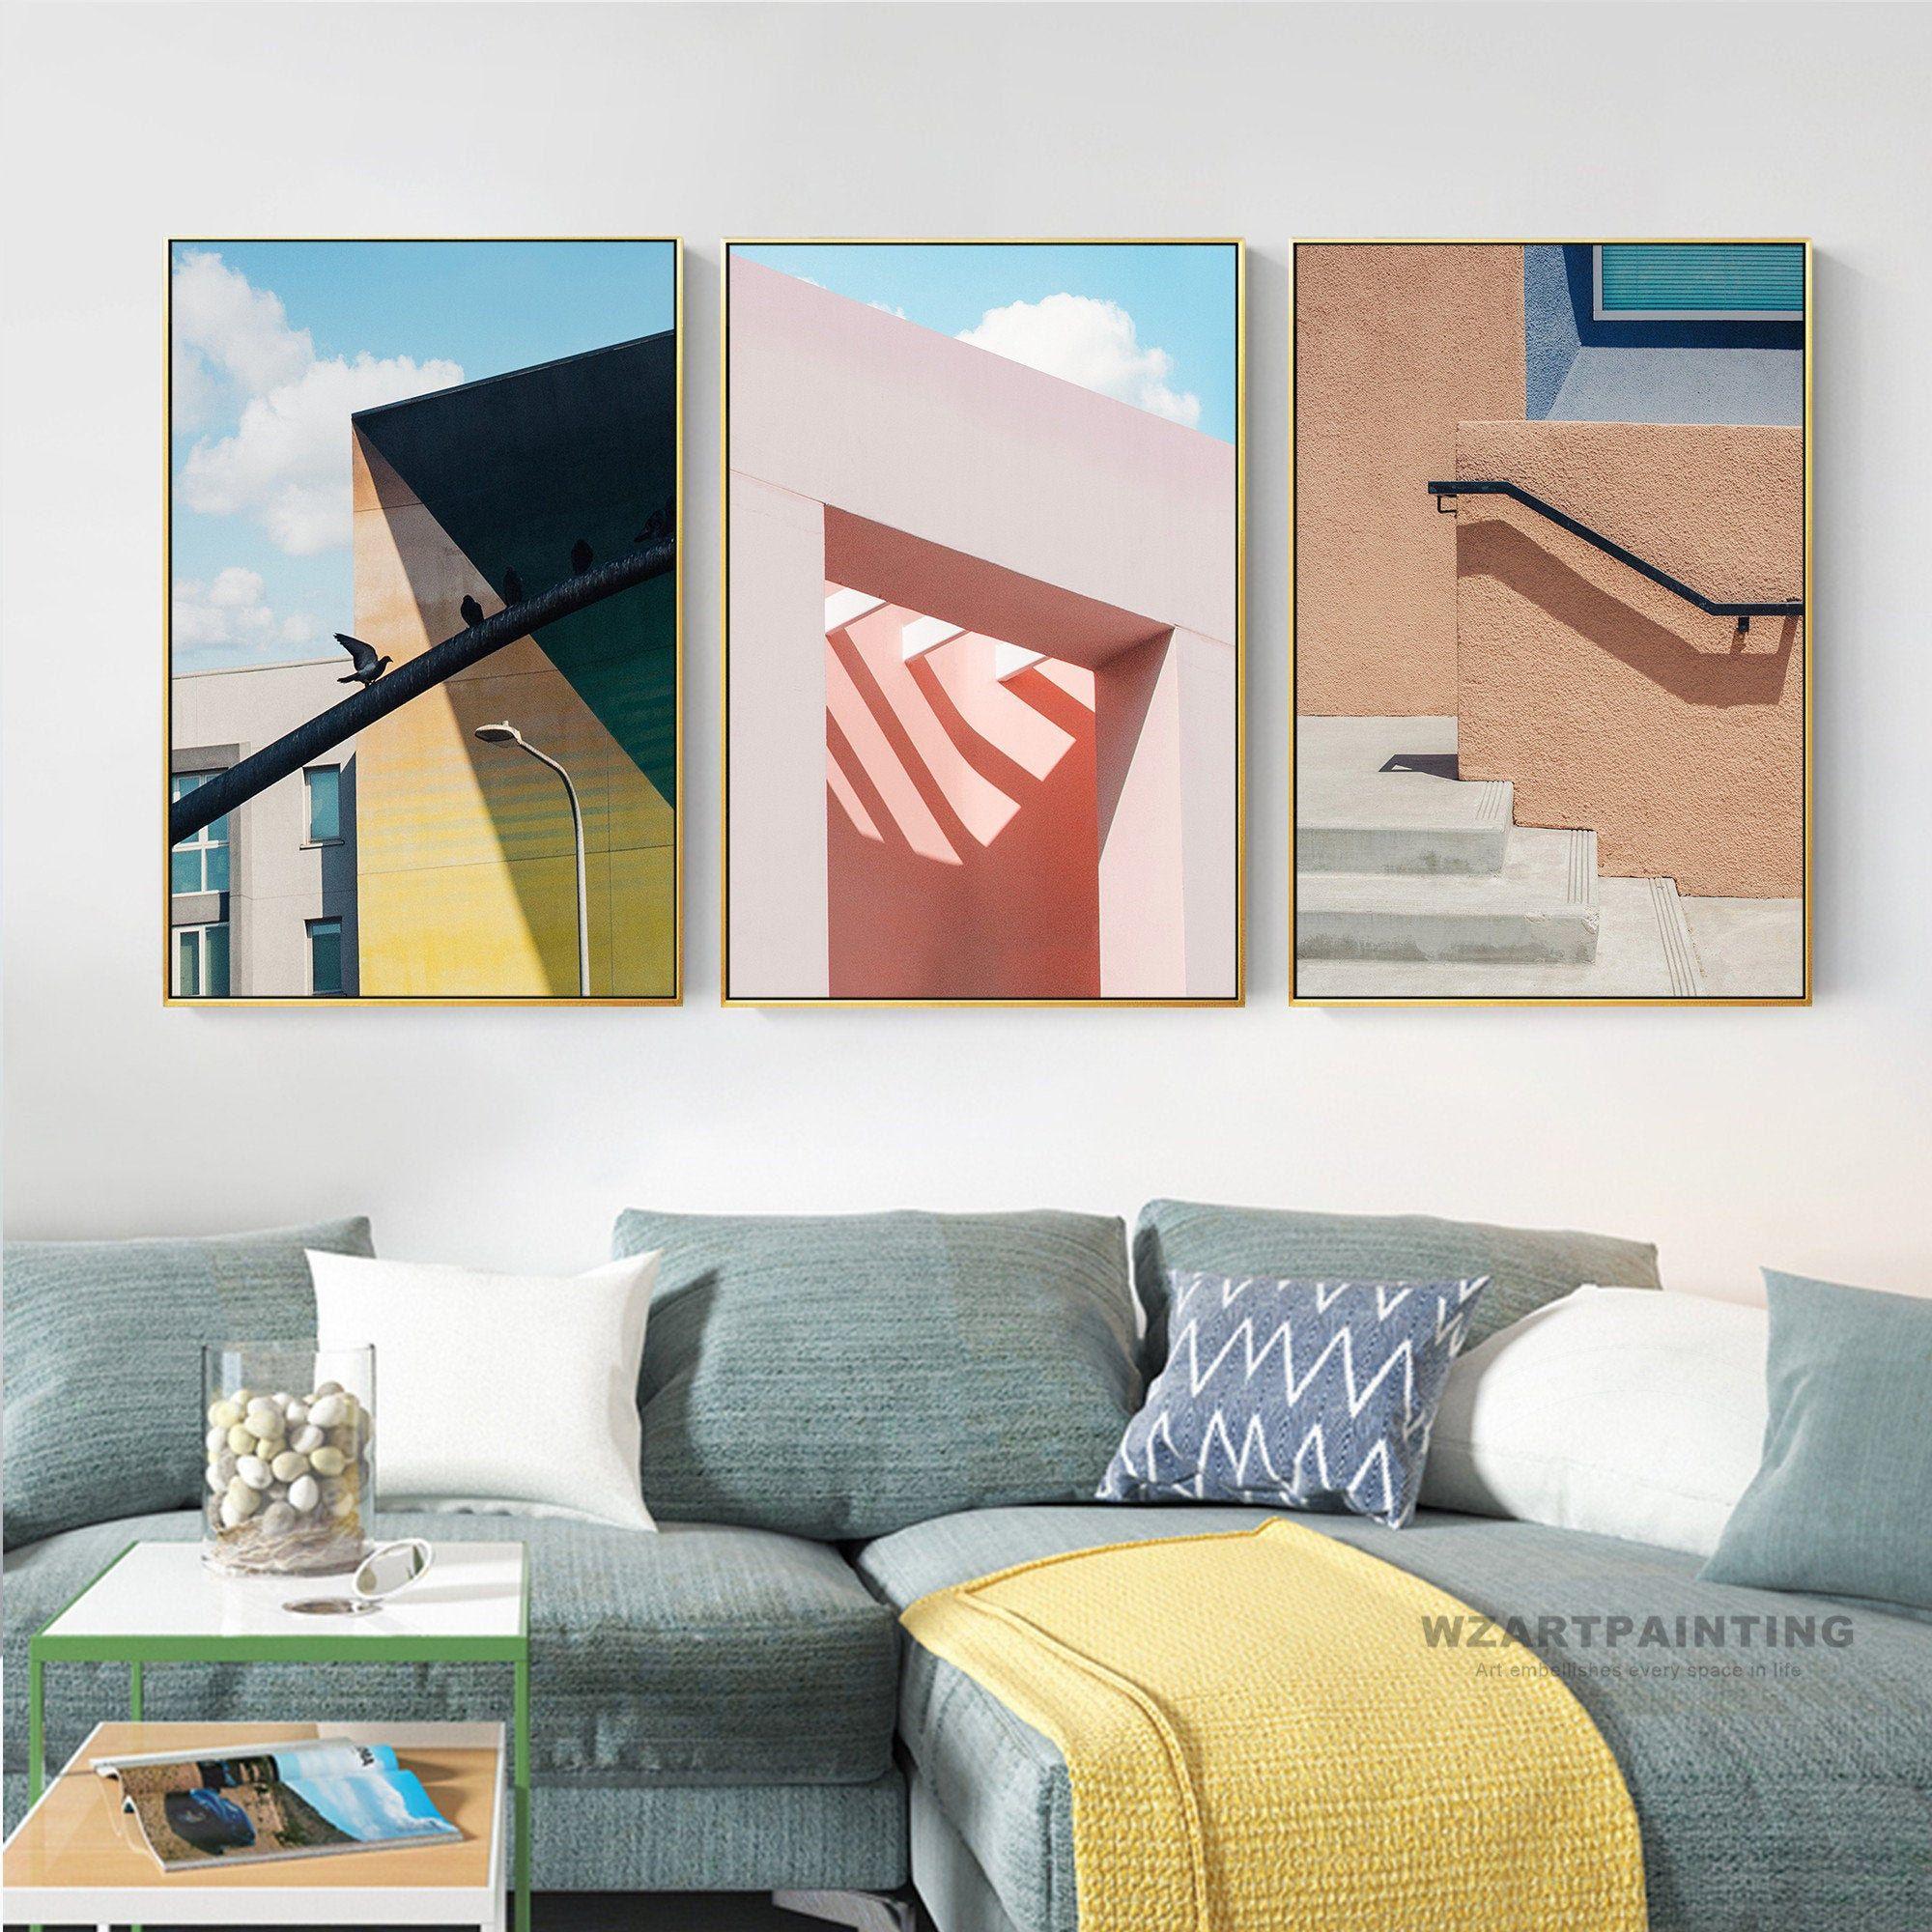 Framed wall art set of 3 prints modern nordic style